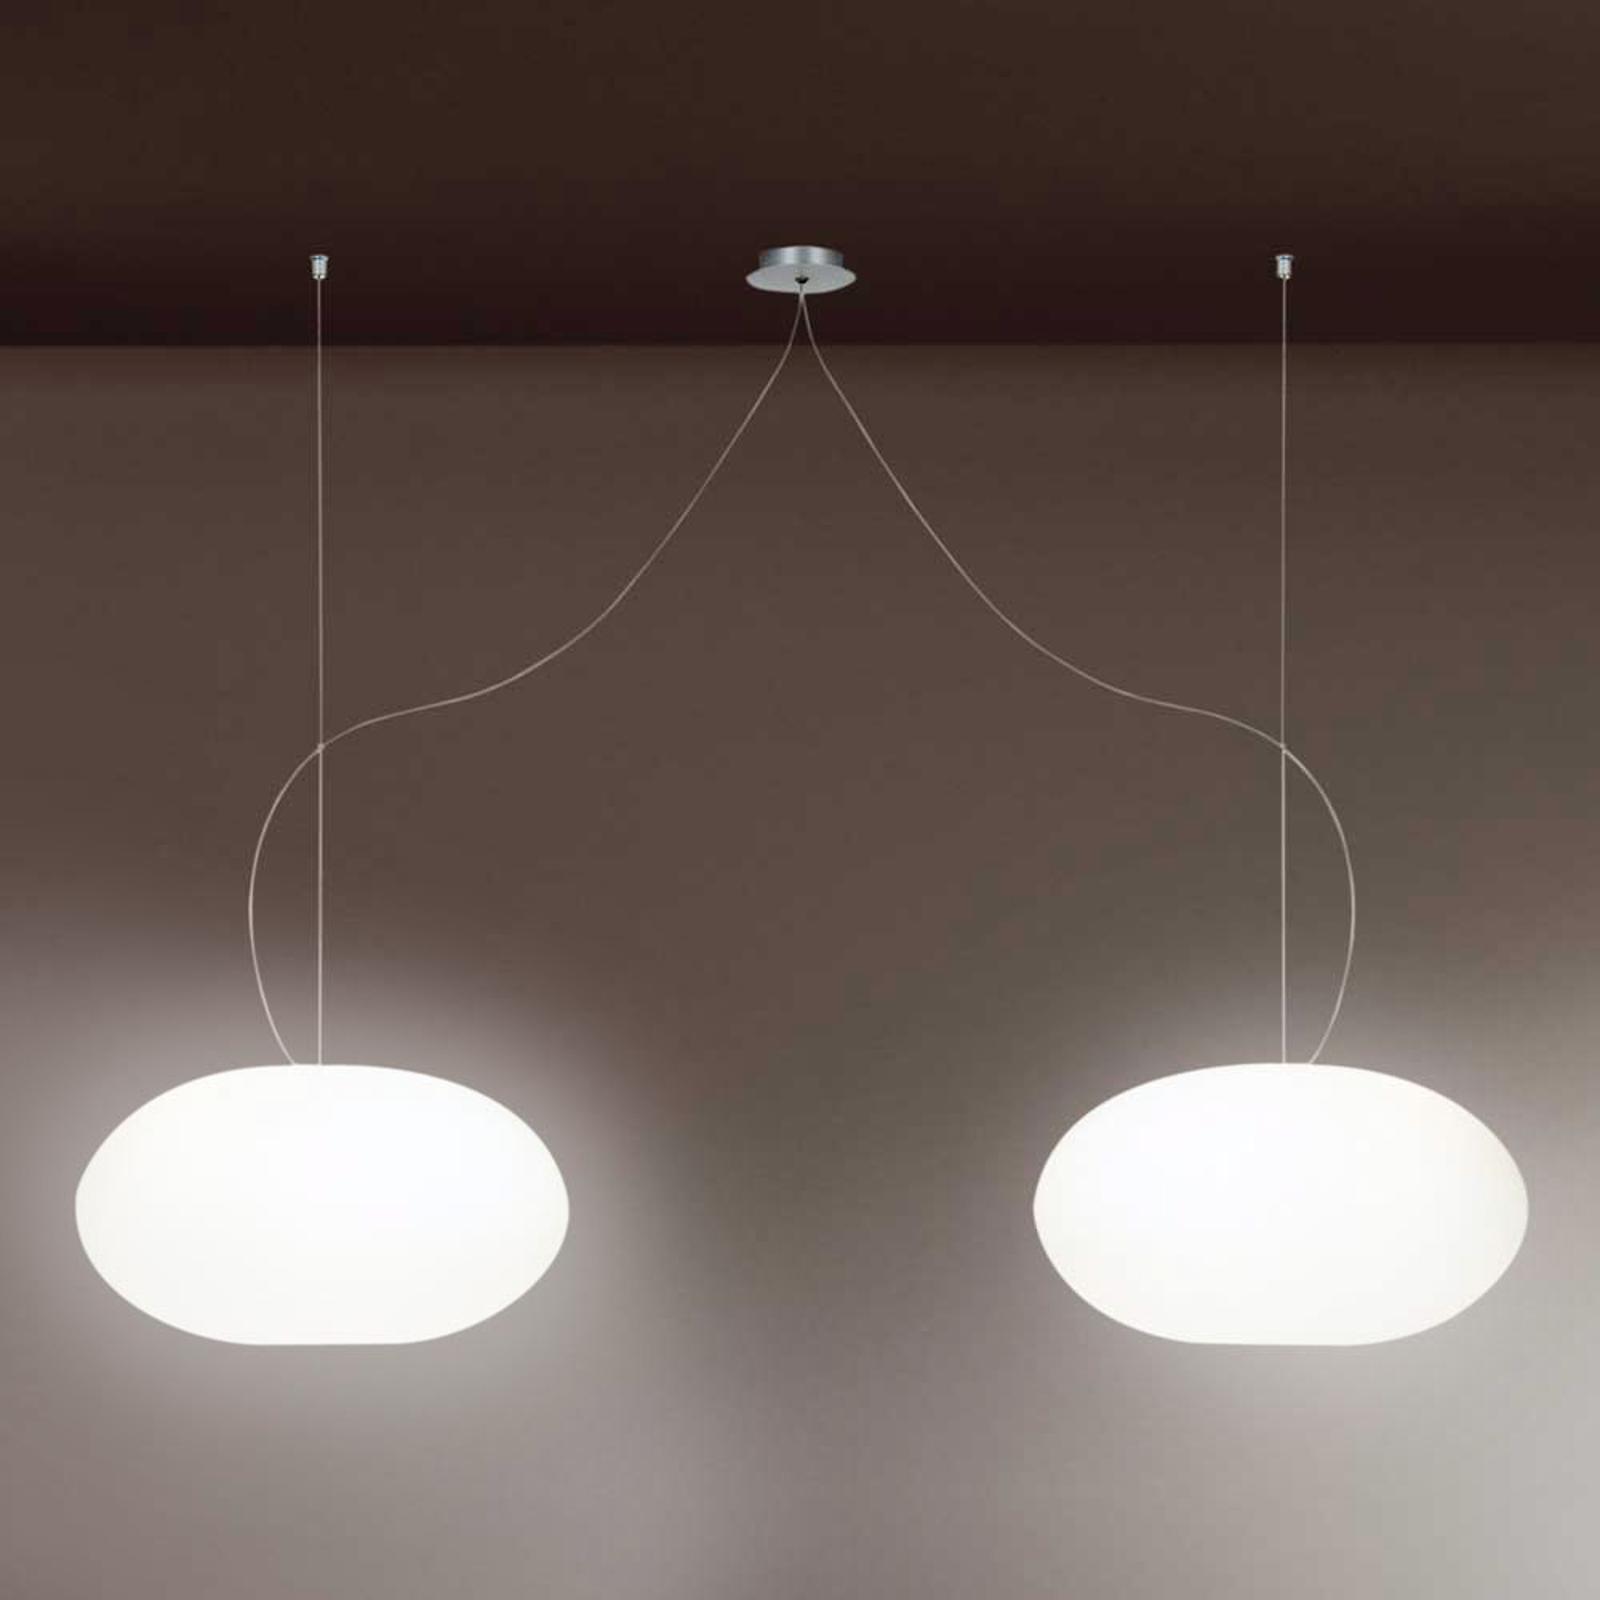 Hængelampe AIH 28 cm, hvid skinnende